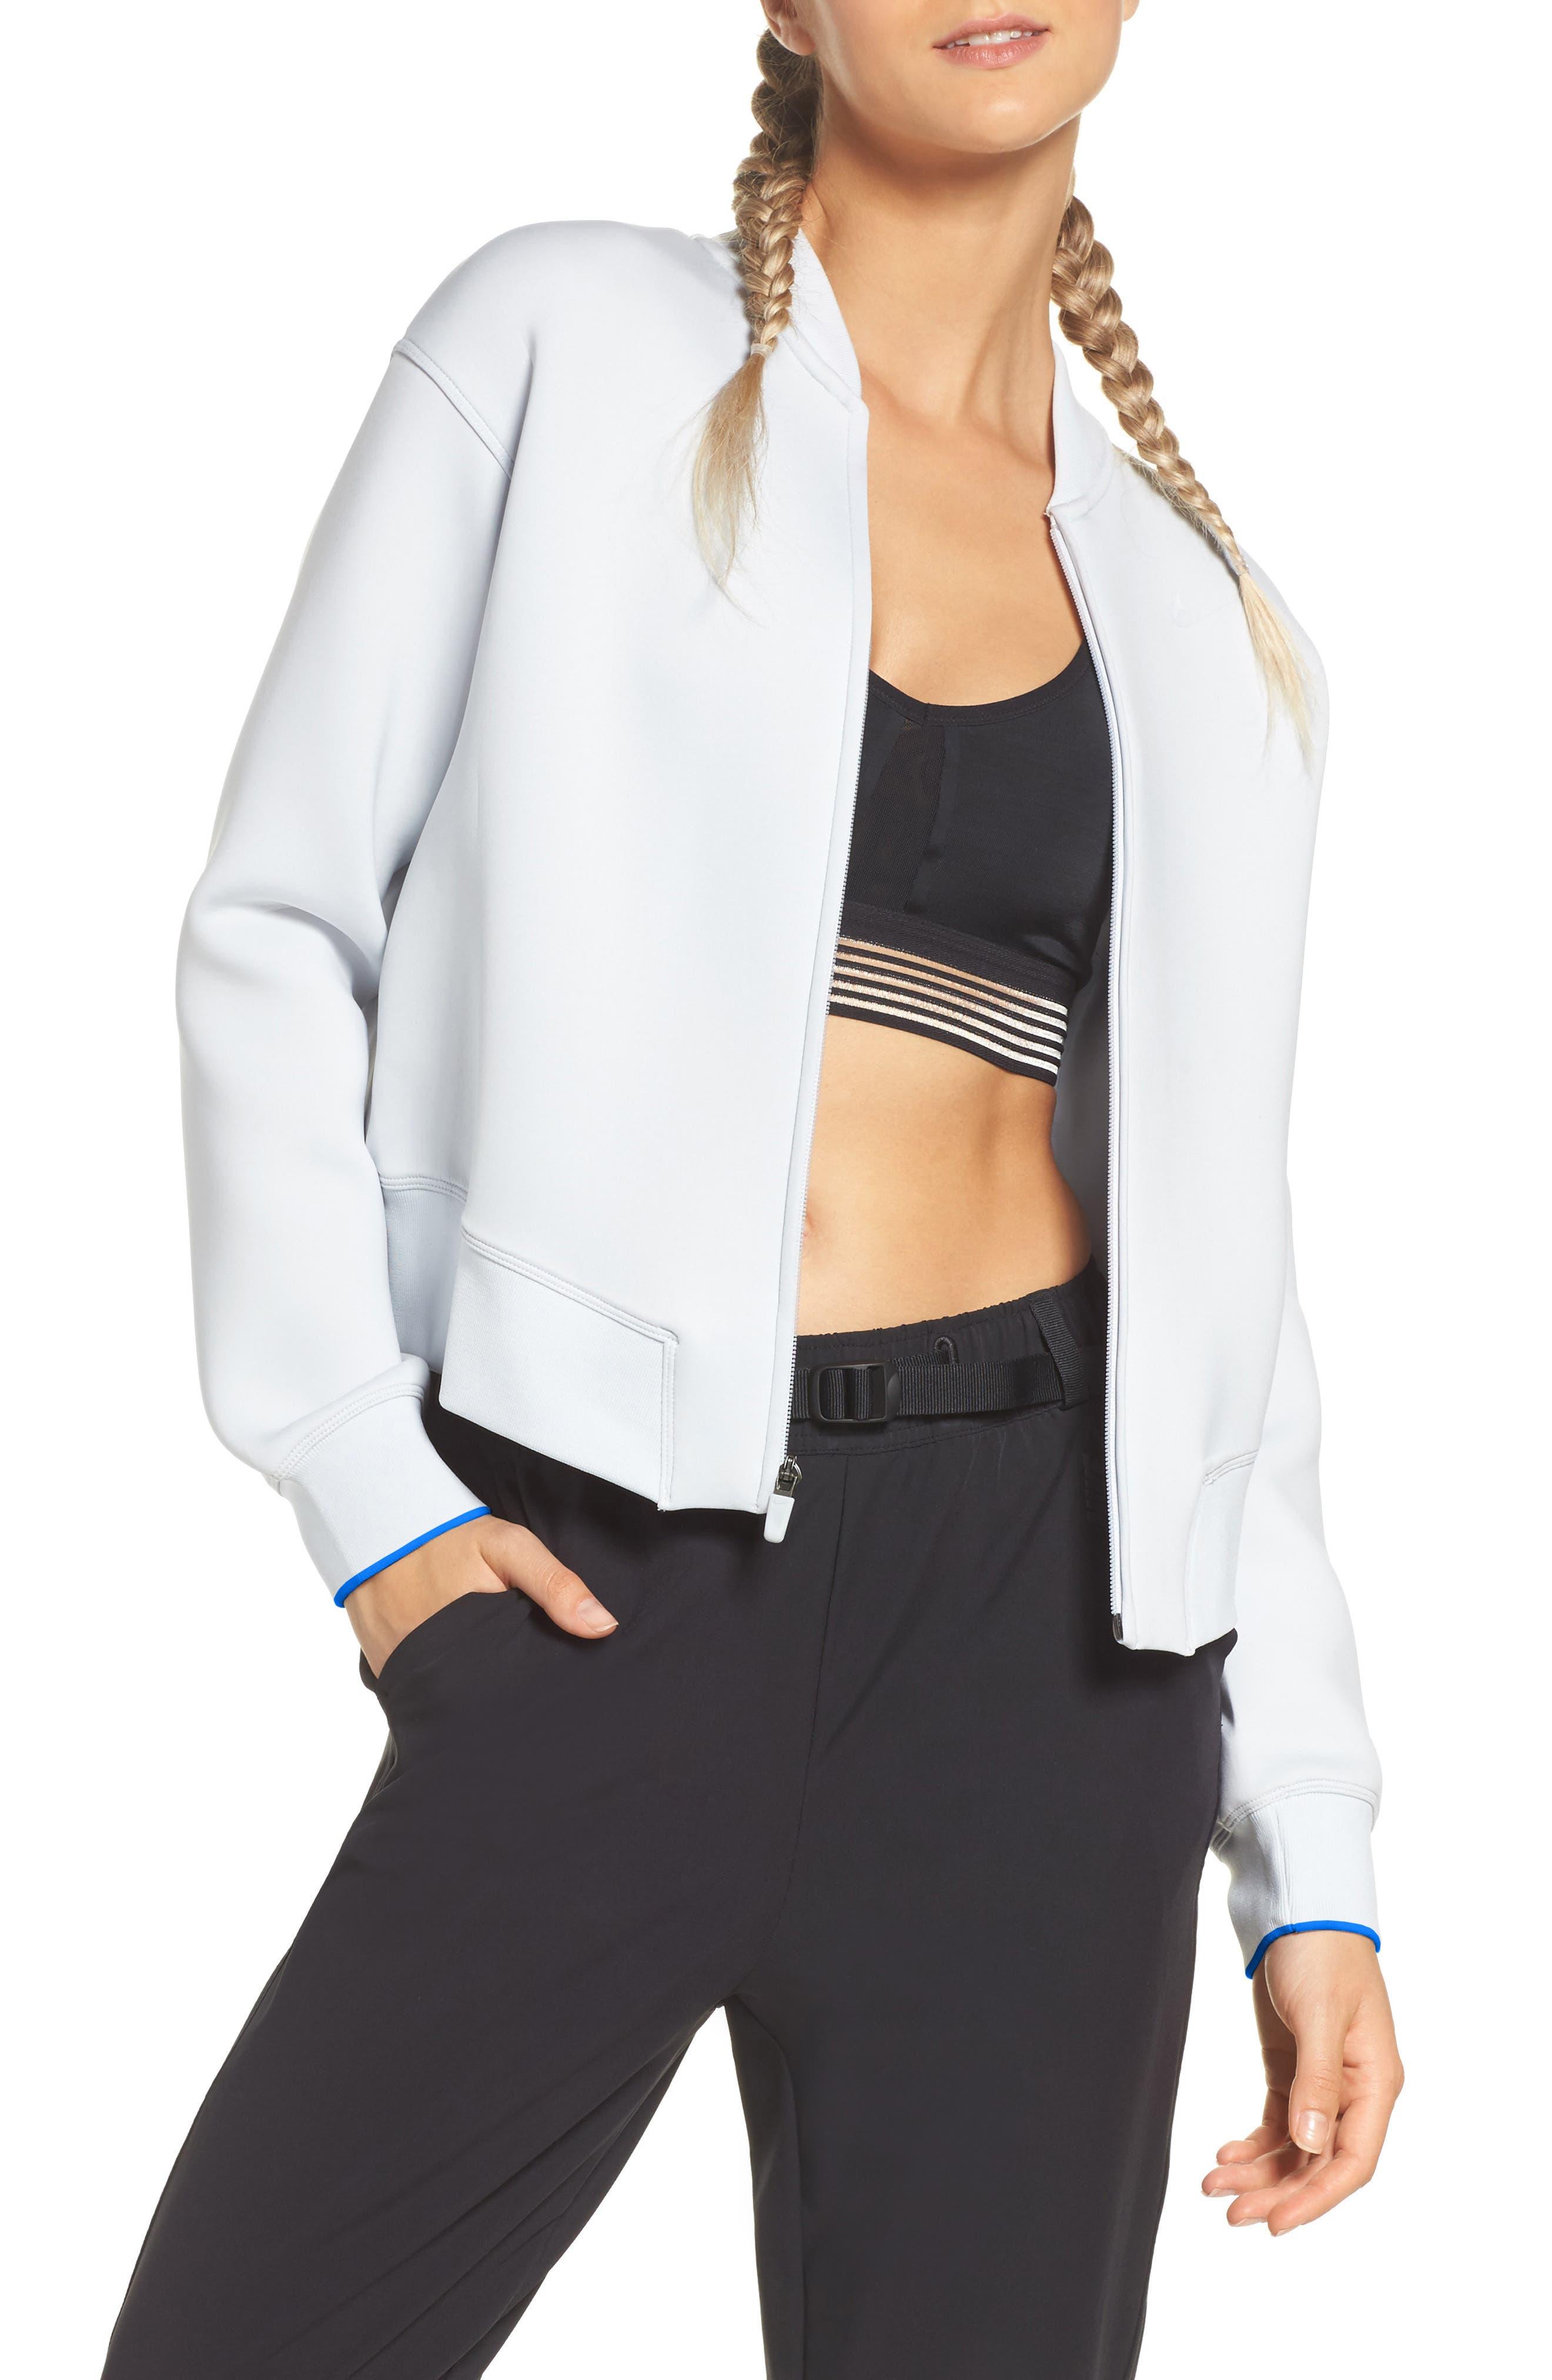 Alternate Image 1 Selected - Nike Therma Sphere Max Training Jacket